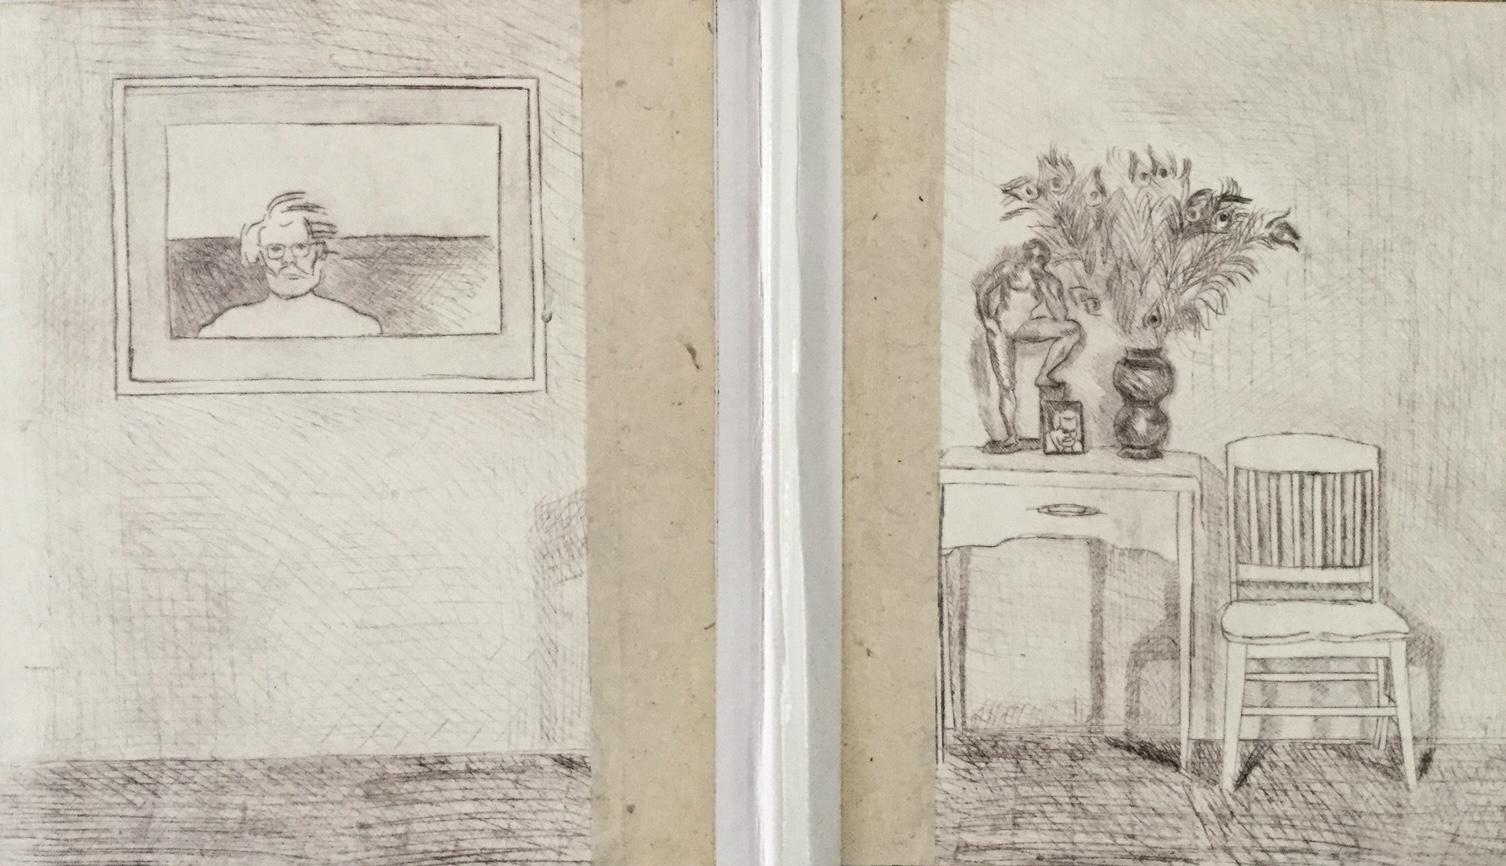 Dry Point Press: Handmade portfolio/ collage, closed